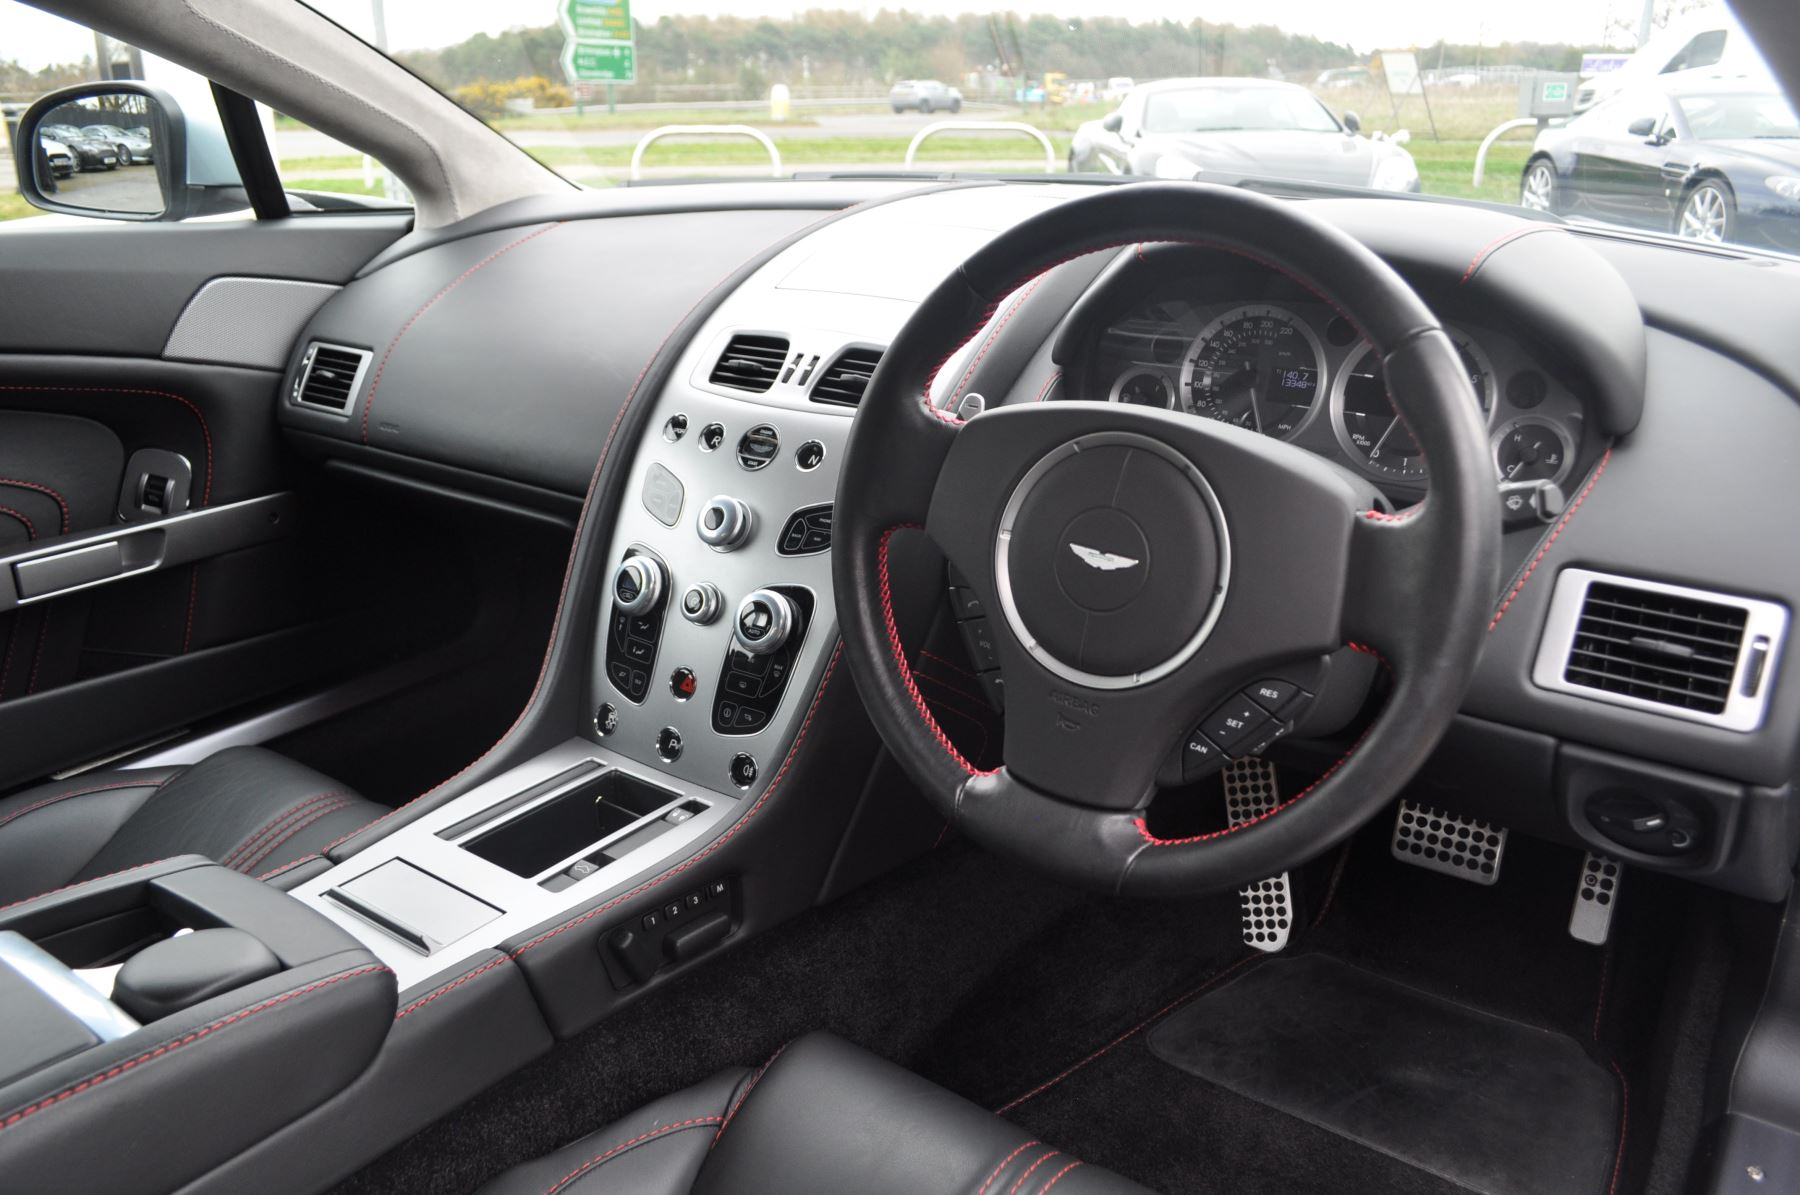 Aston Martin V8 Vantage S Coupe Coupe image 21